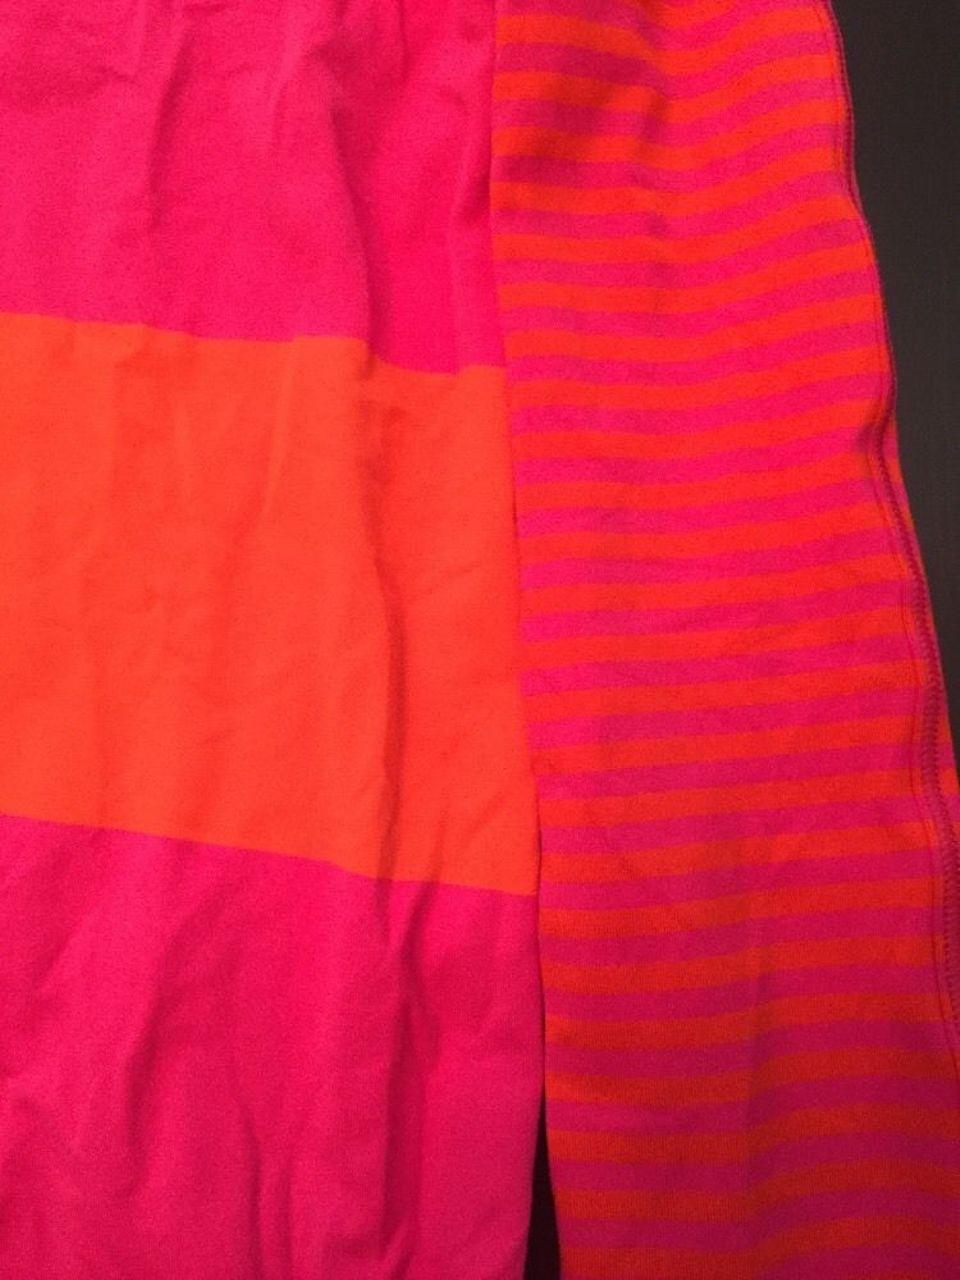 Lululemon Tuck and Flow Long Sleeve - 2015 Seawheeze - Bold Stripe / Classic Stripe Jeweled Magenta